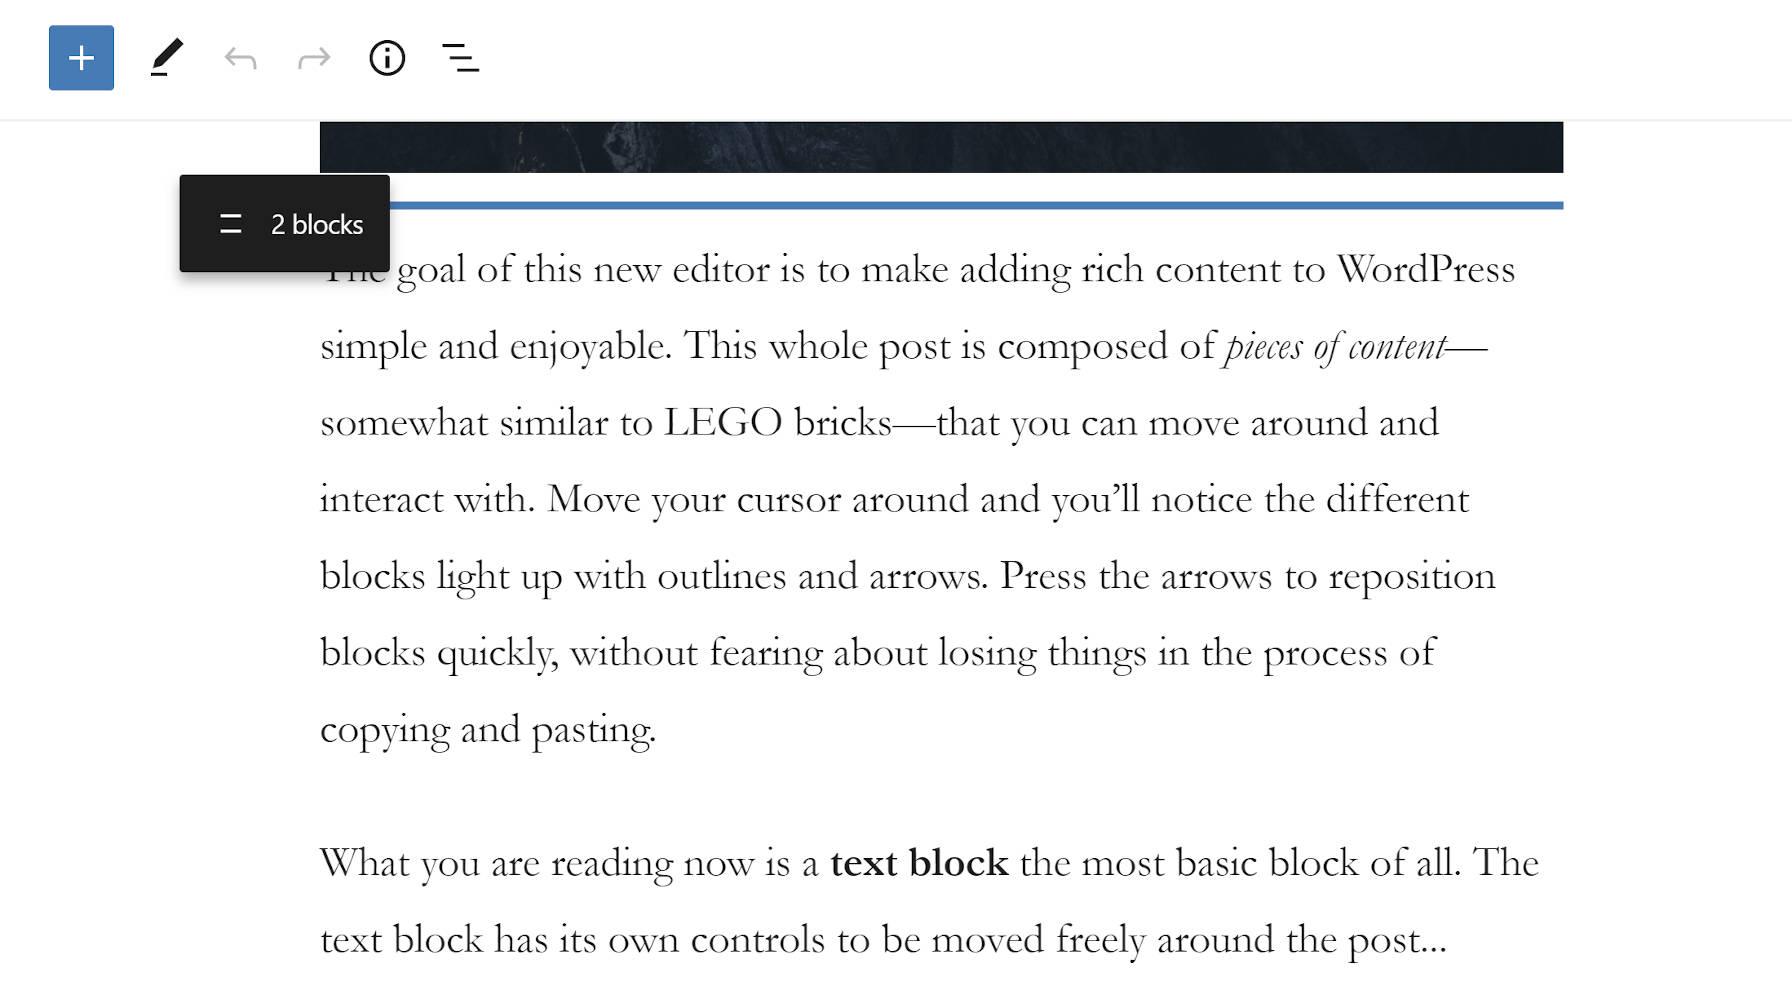 gutenberg-8-5添加了一个单库图像编辑允许图像从外部来源上传并改进拖放1 Gutenberg 8.5添加单个库图像编辑,允许图像上传从外部来源,并改善拖放